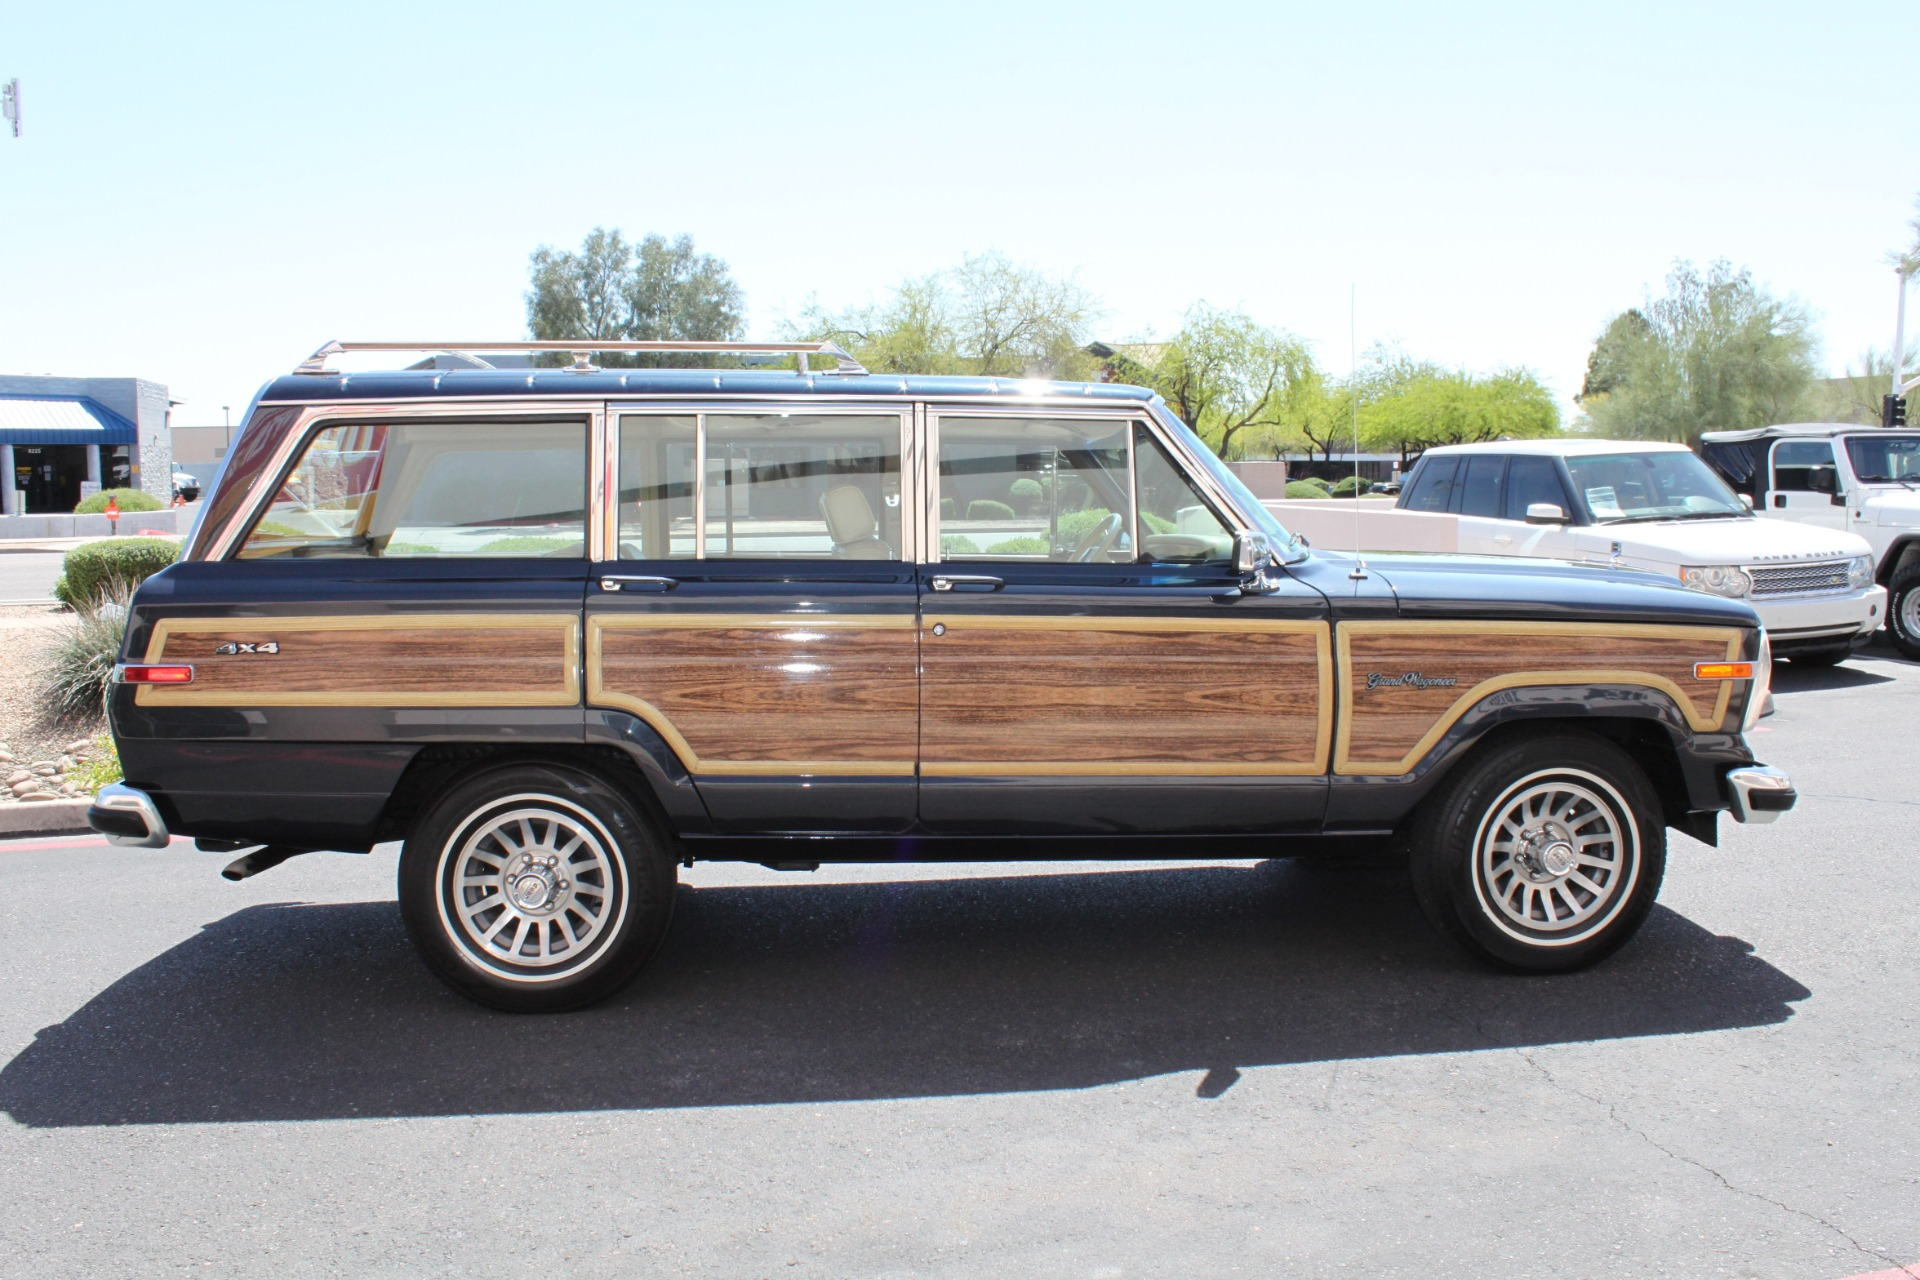 Used-1991-Jeep-Grand-Wagoneer-4X4-Chrysler